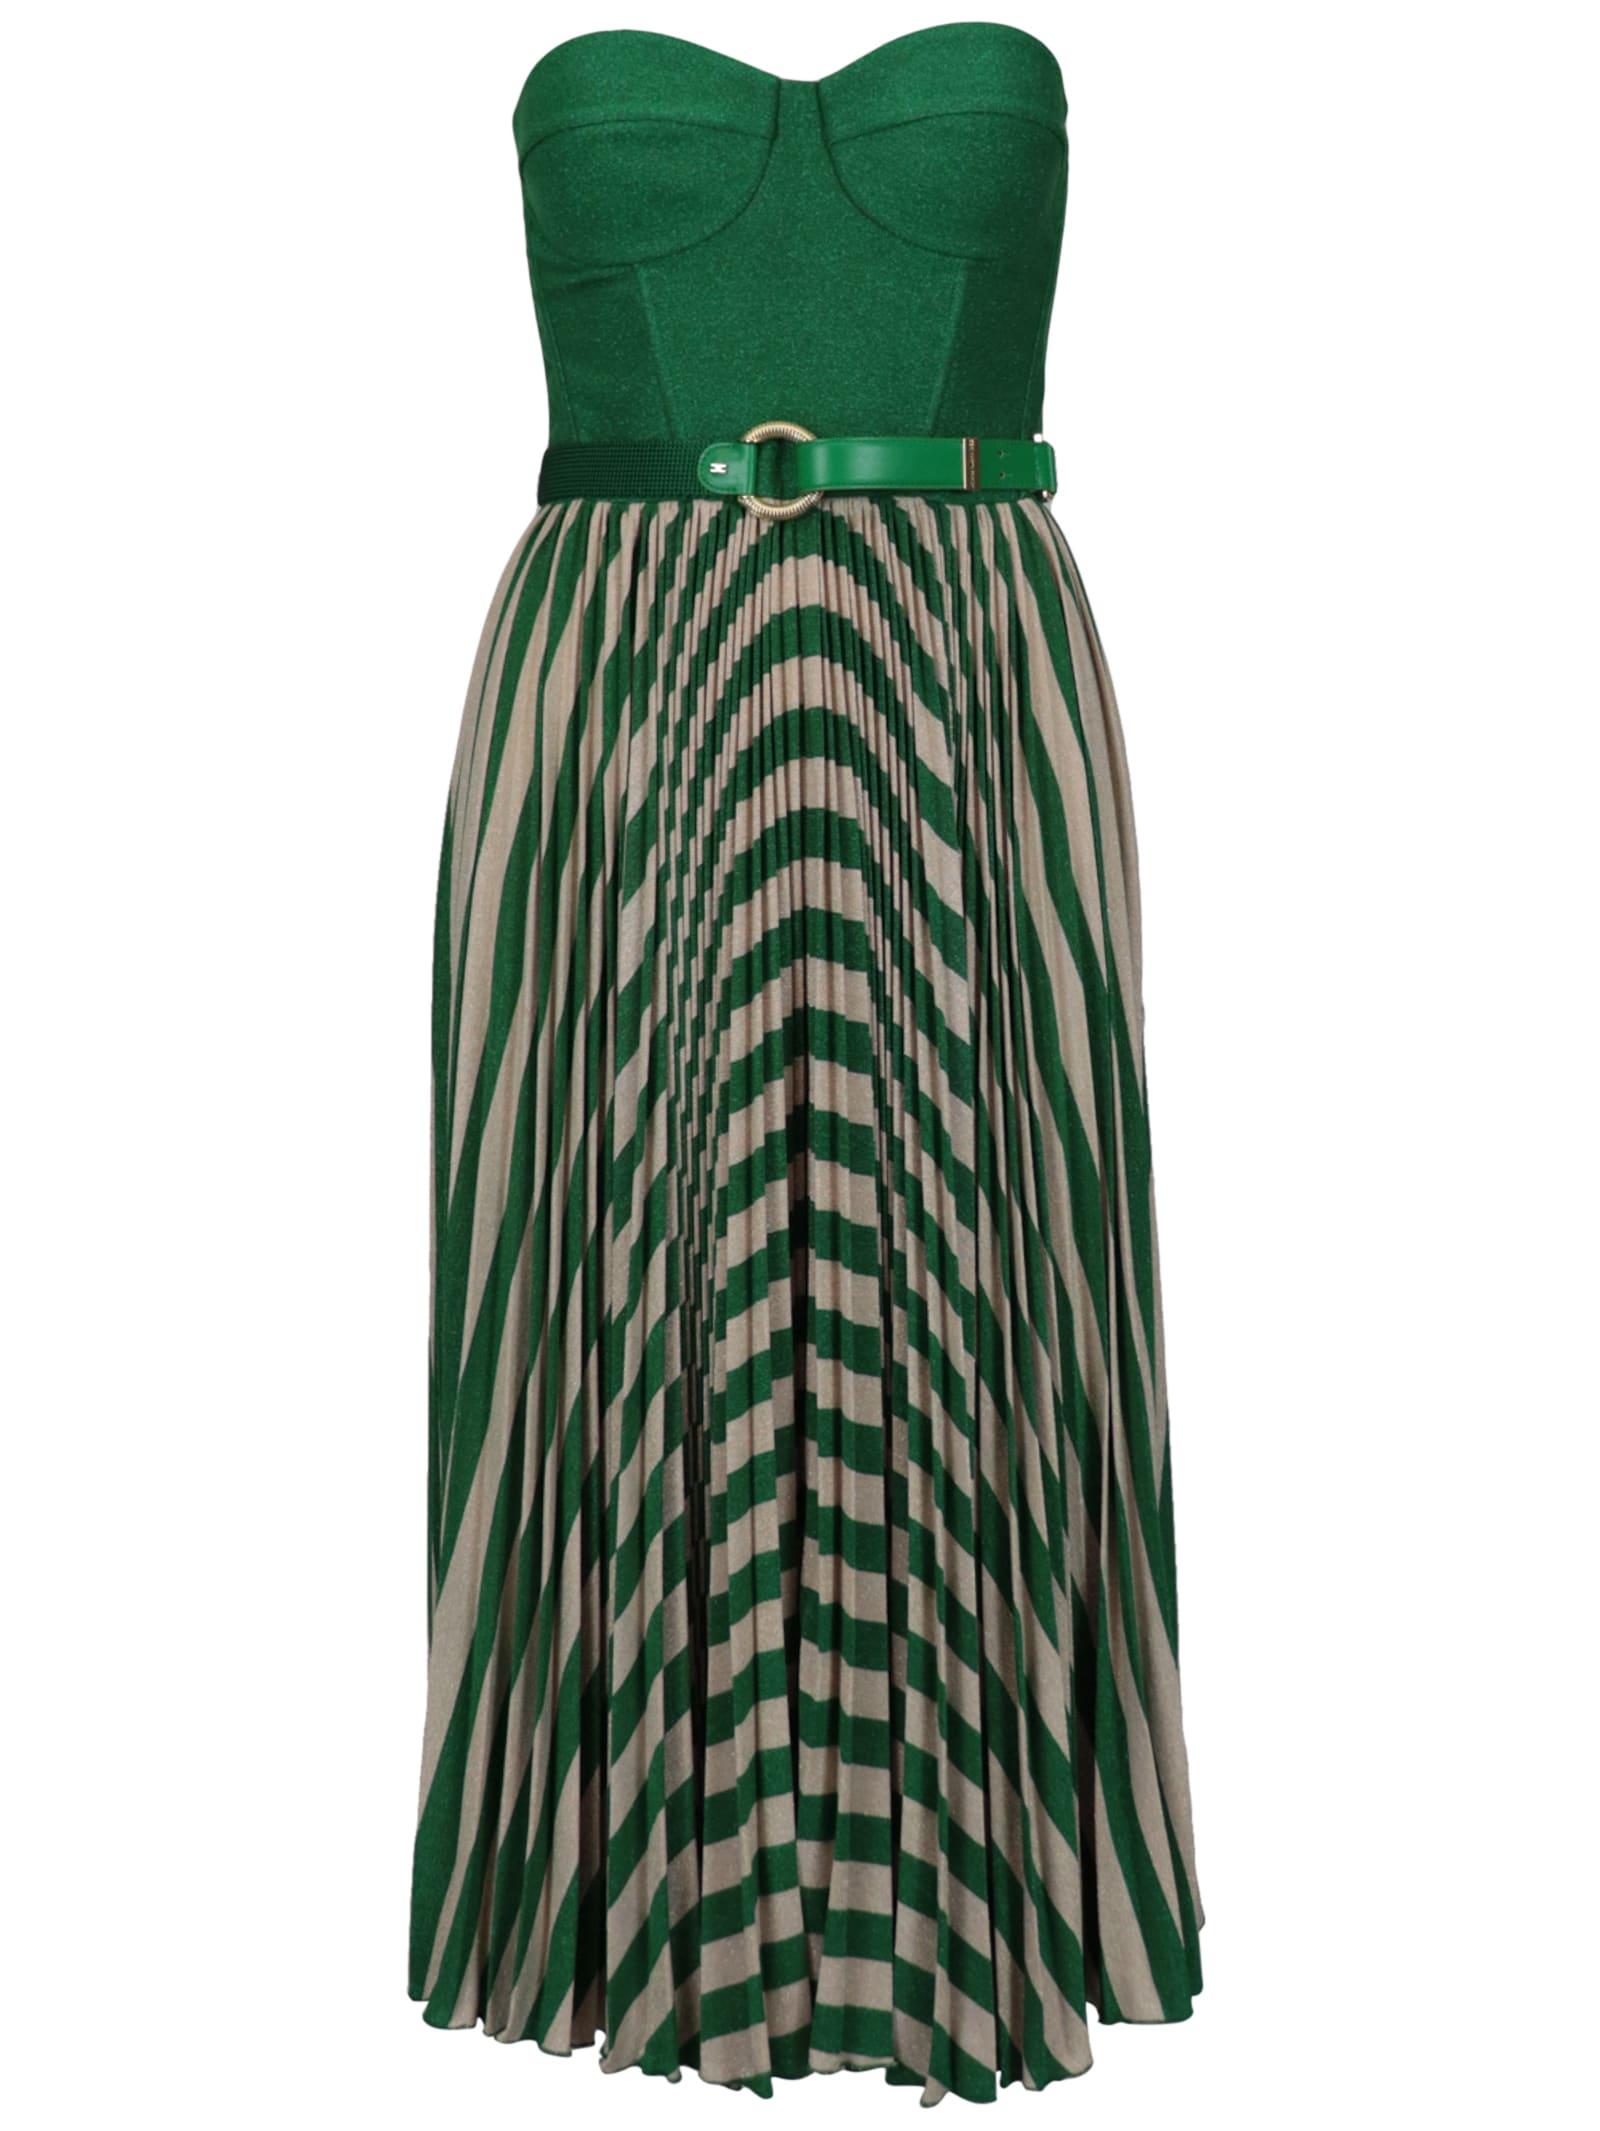 Buy Elisabetta Franchi Celyn B. Jersey Lamè Dress online, shop Elisabetta Franchi Celyn B. with free shipping